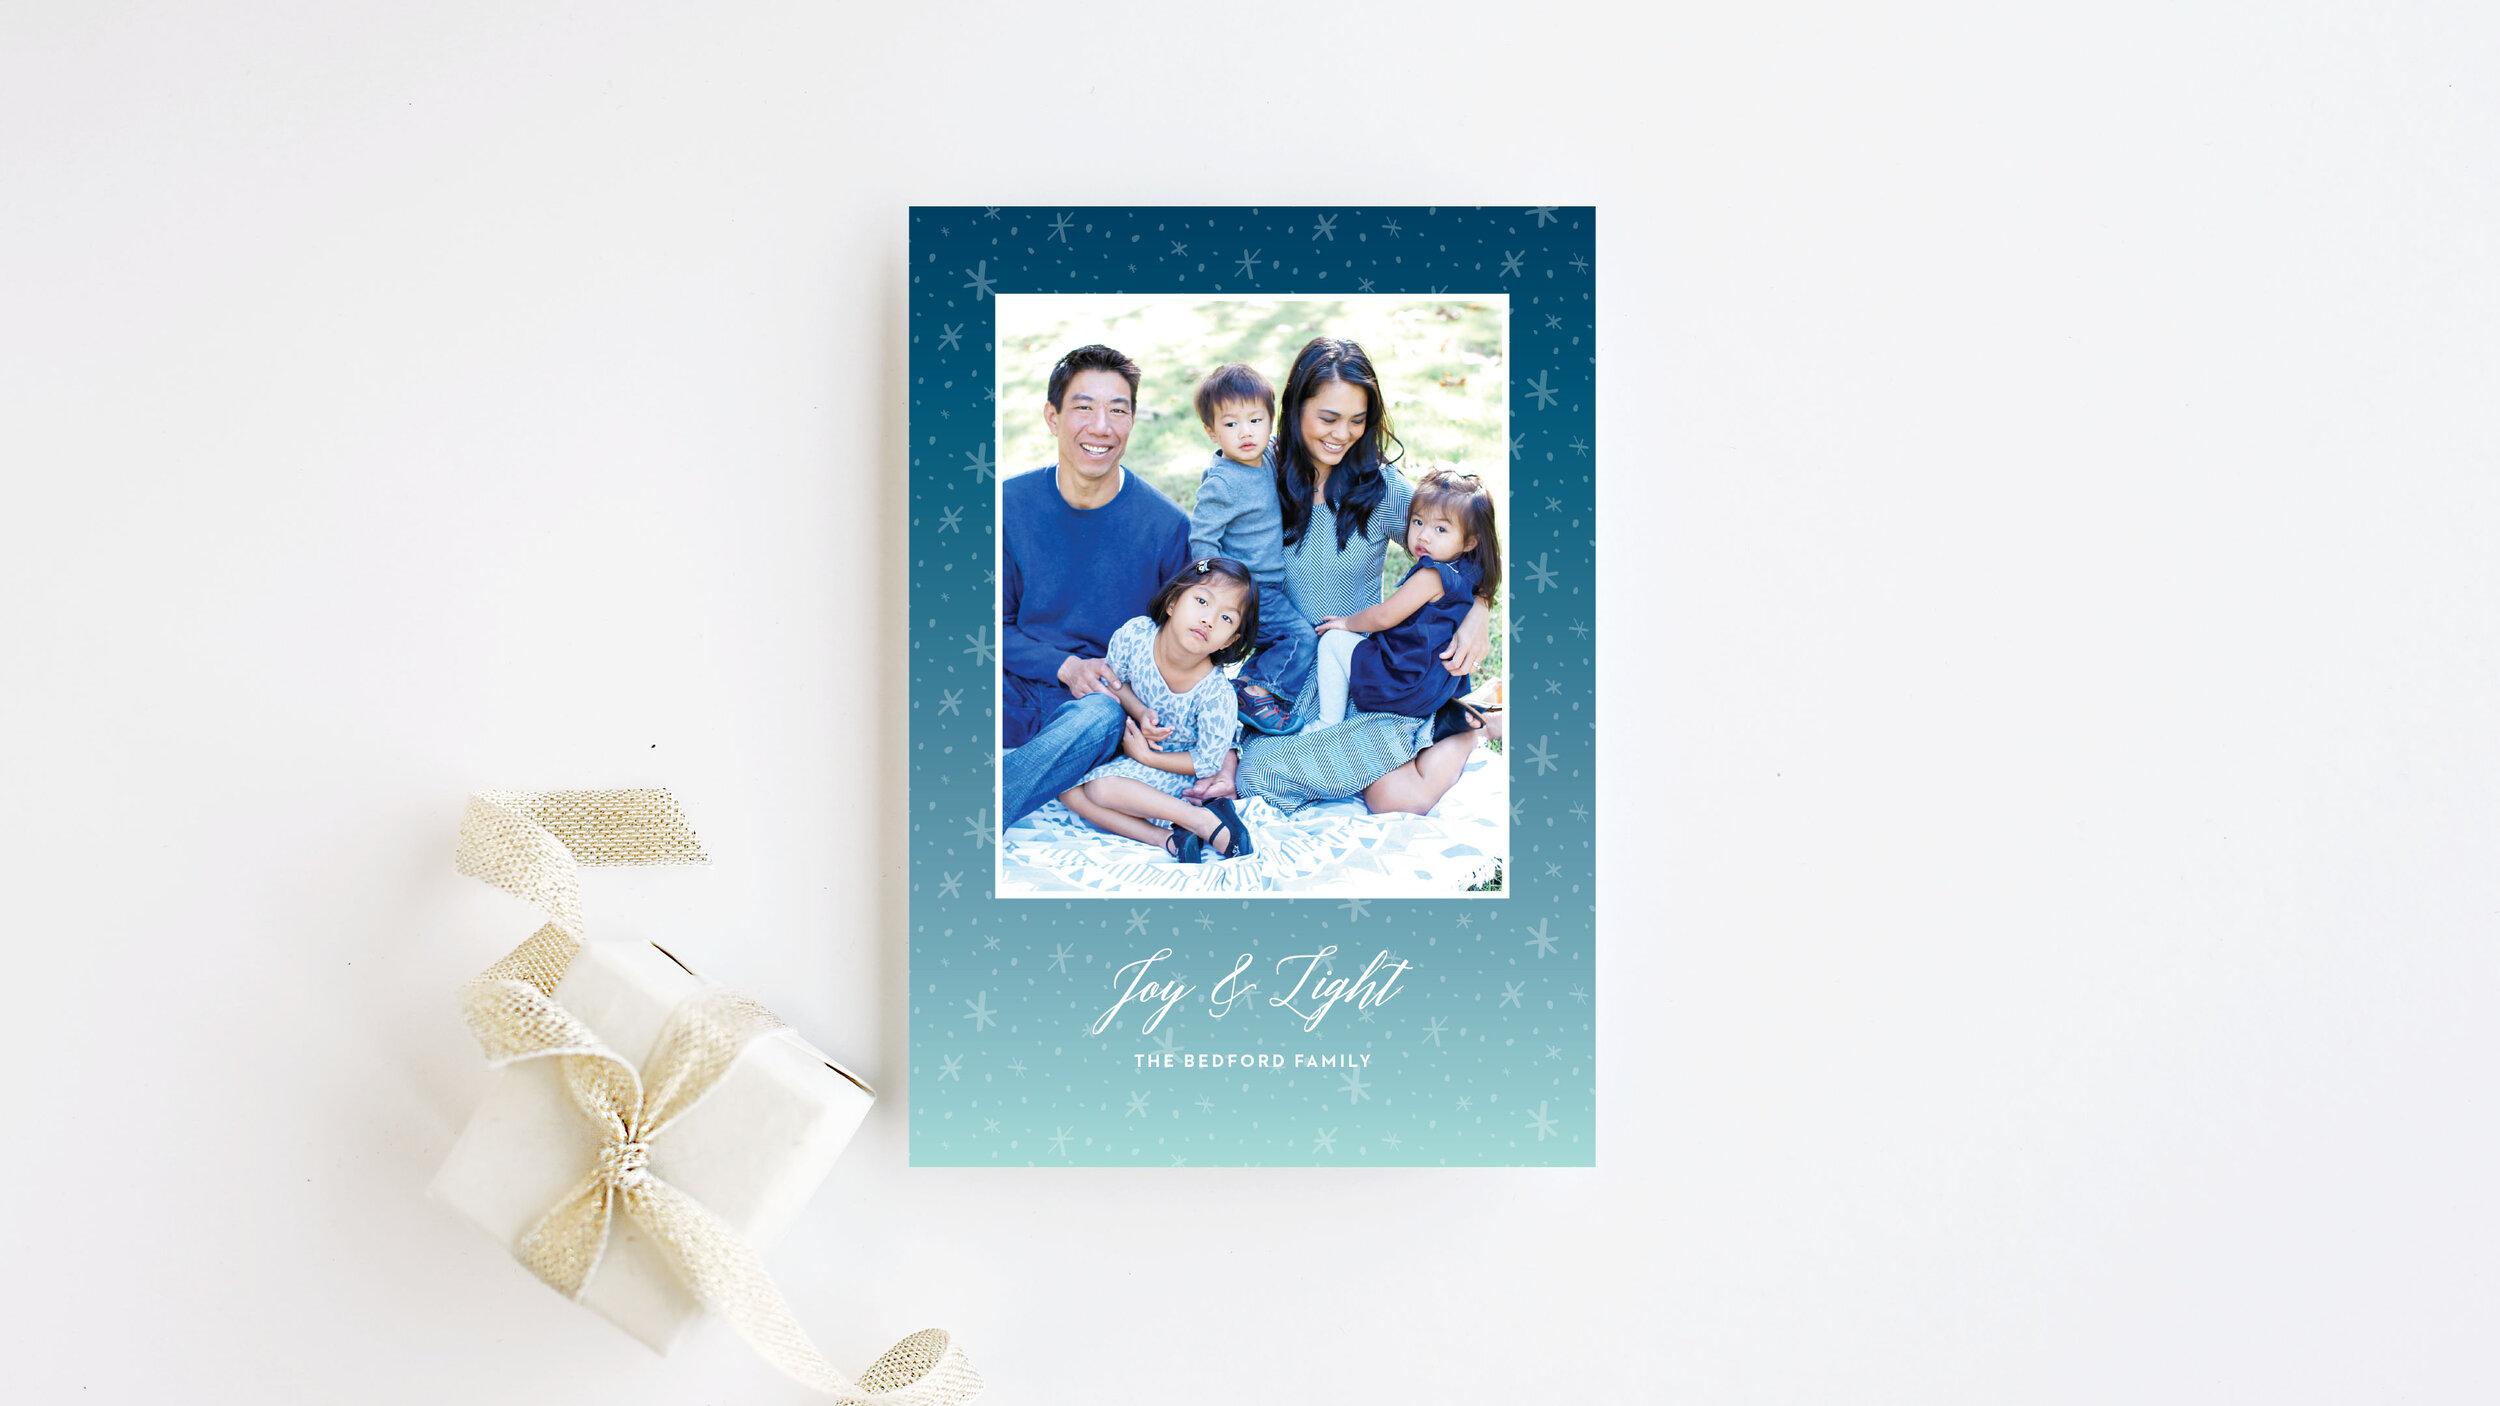 Basic_Invite_Holiday_Cards_27.jpg